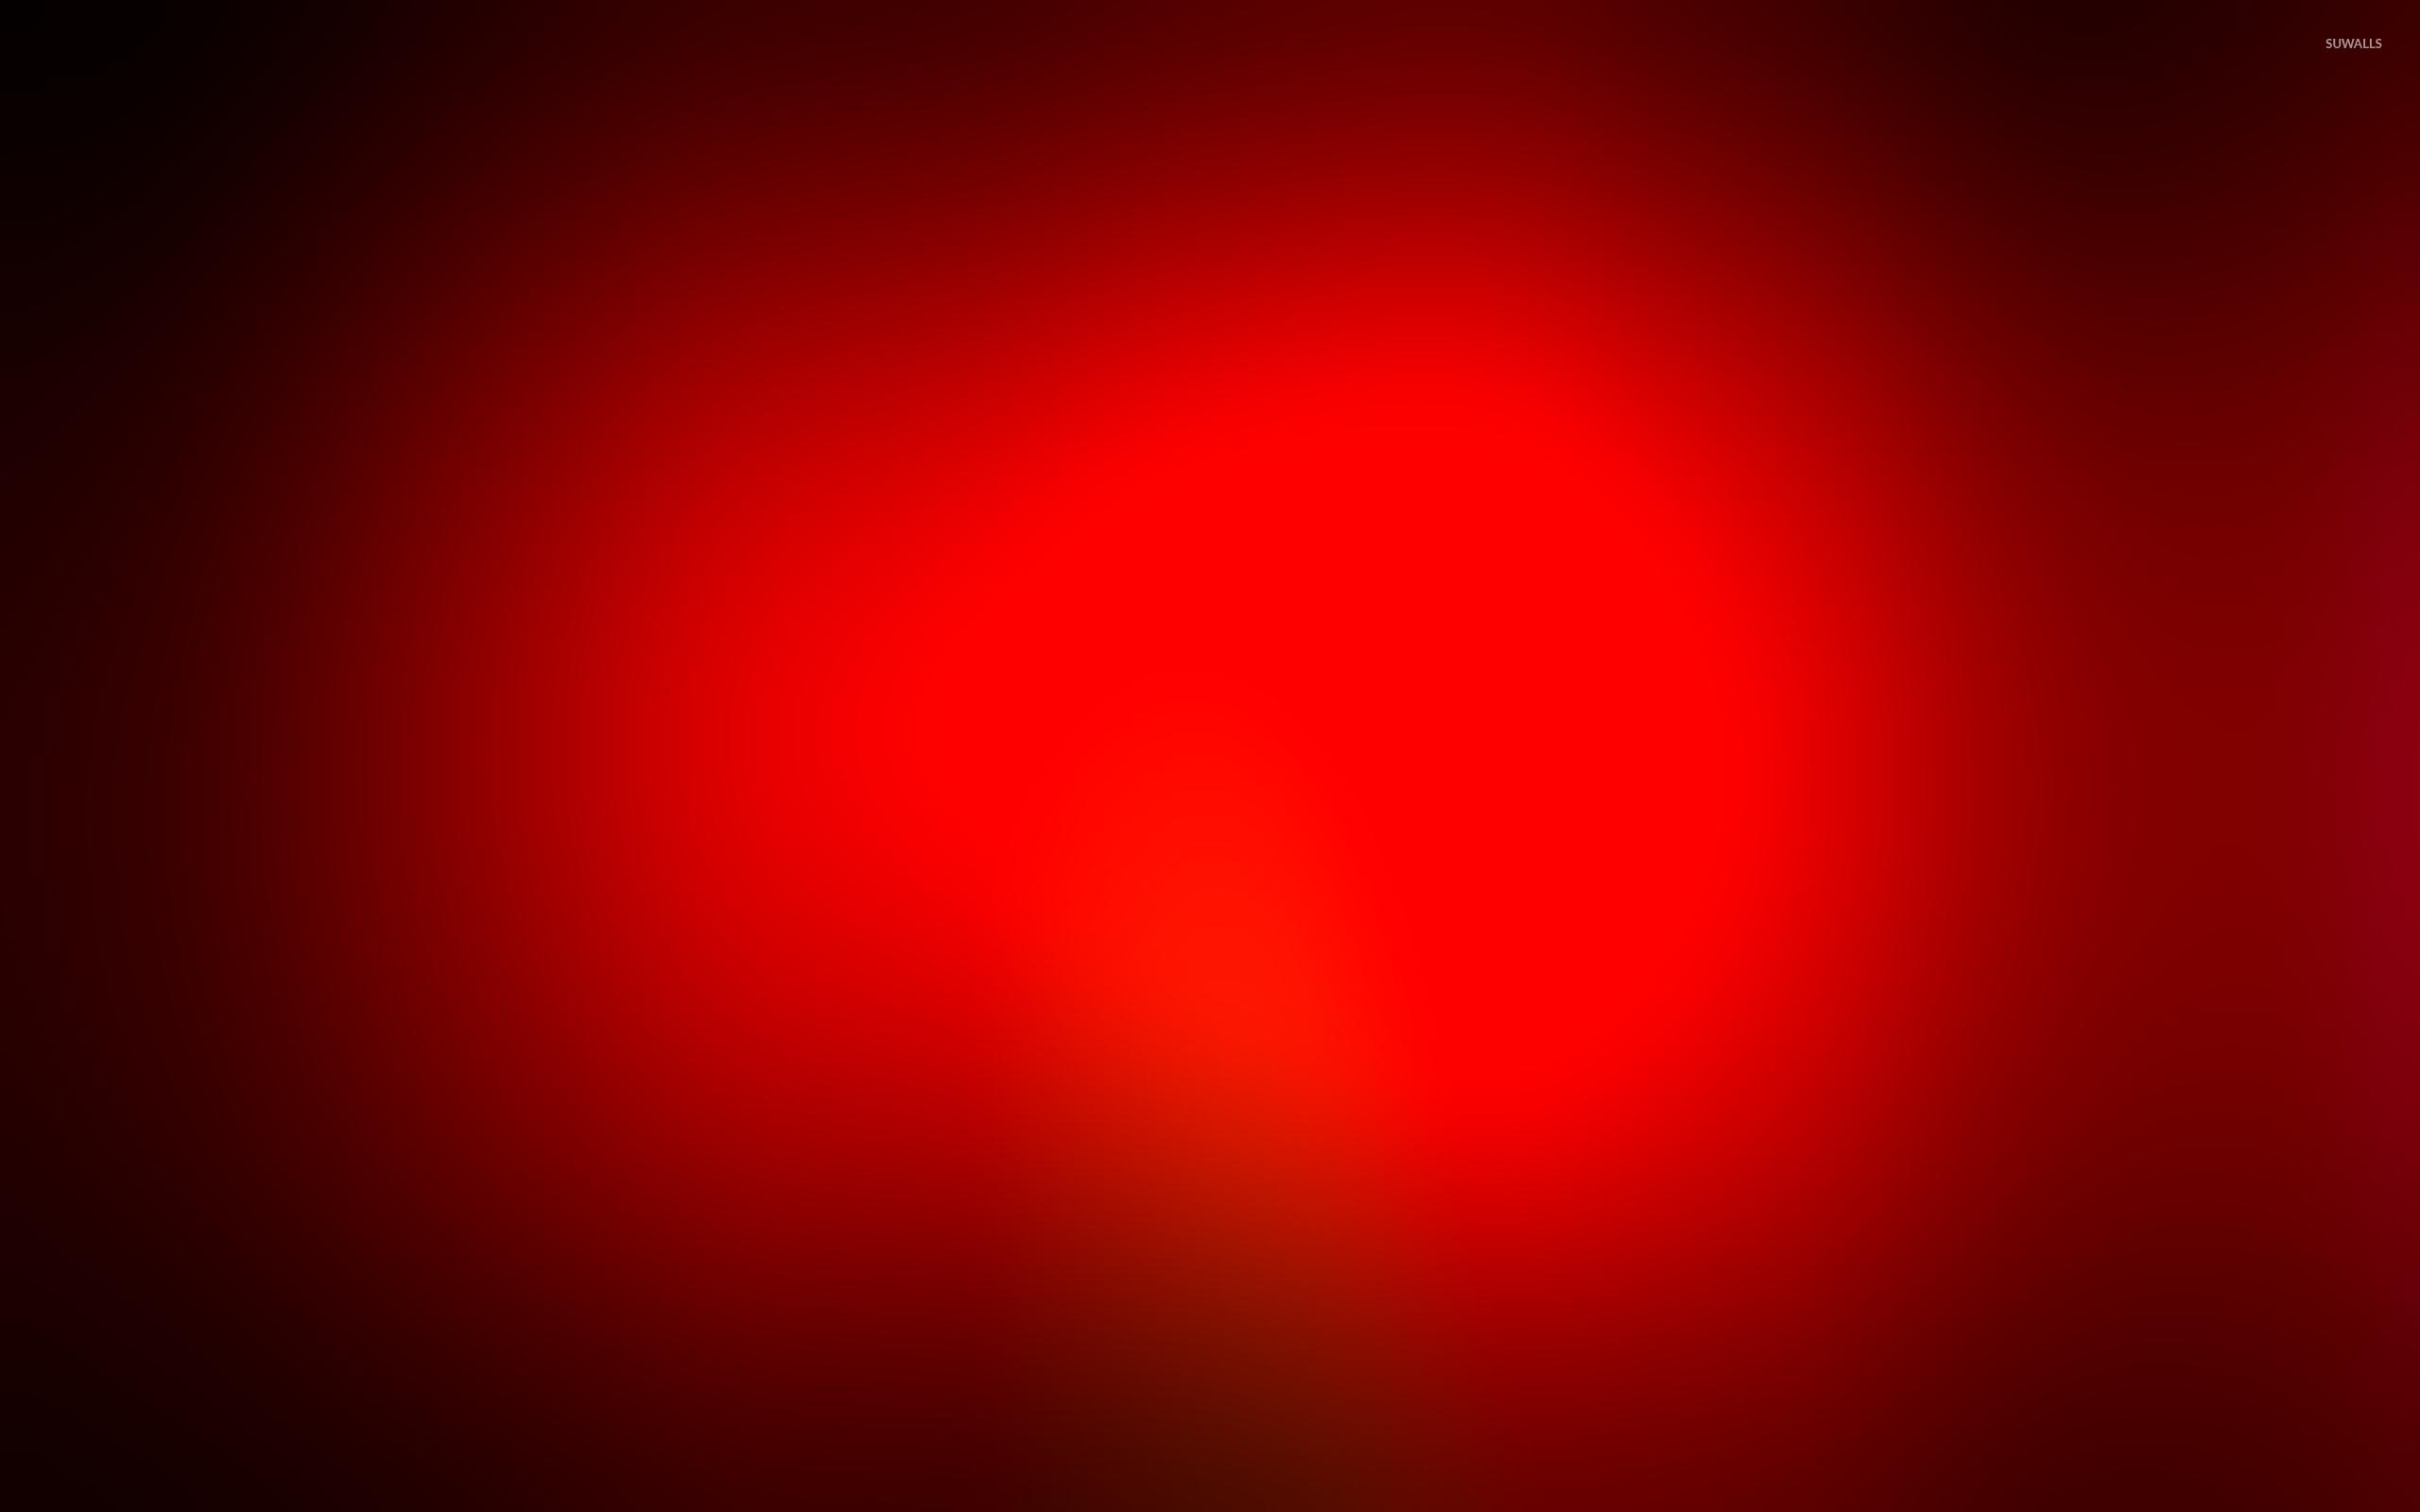 Red gradient wallpaper wallpapersafari for Red wallpaper for walls